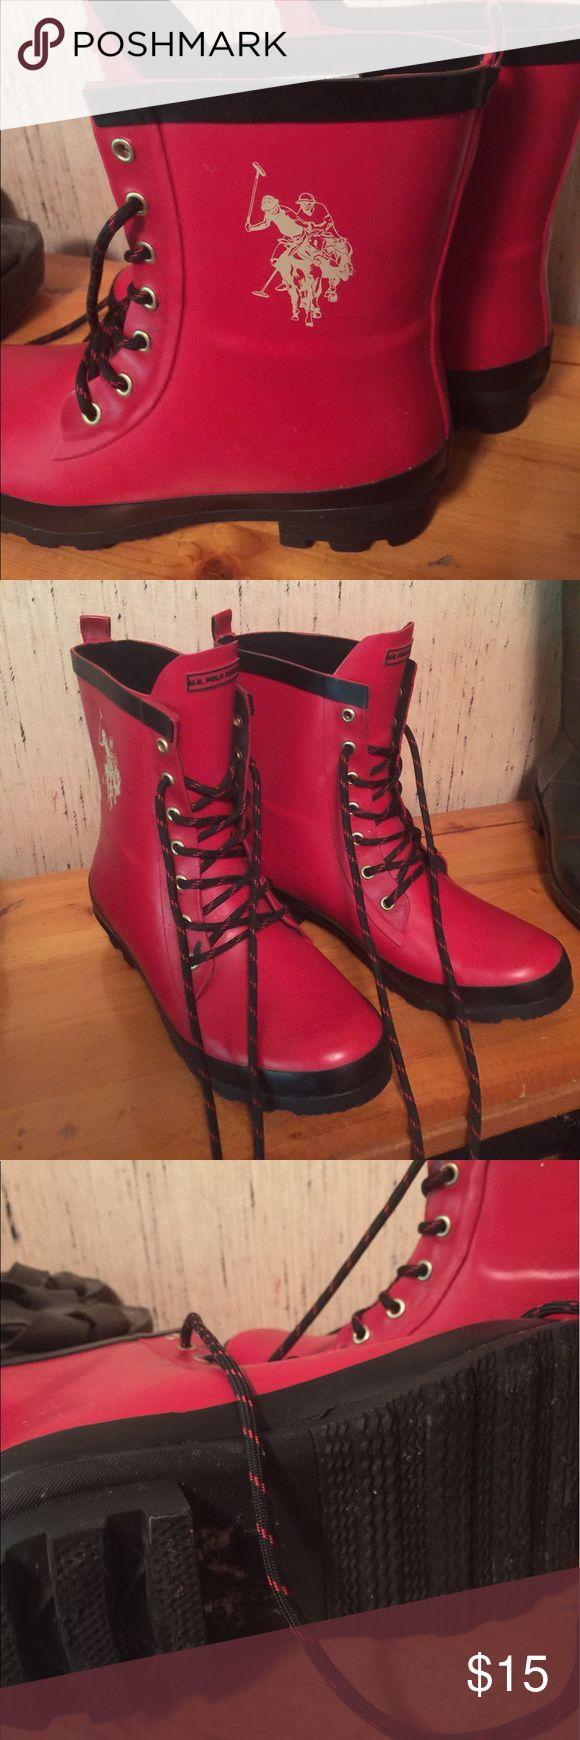 Ralp Lauren rain boots Red and in GREAT condition! Lauren Ralph Lauren Shoes Winter & Rain Boots